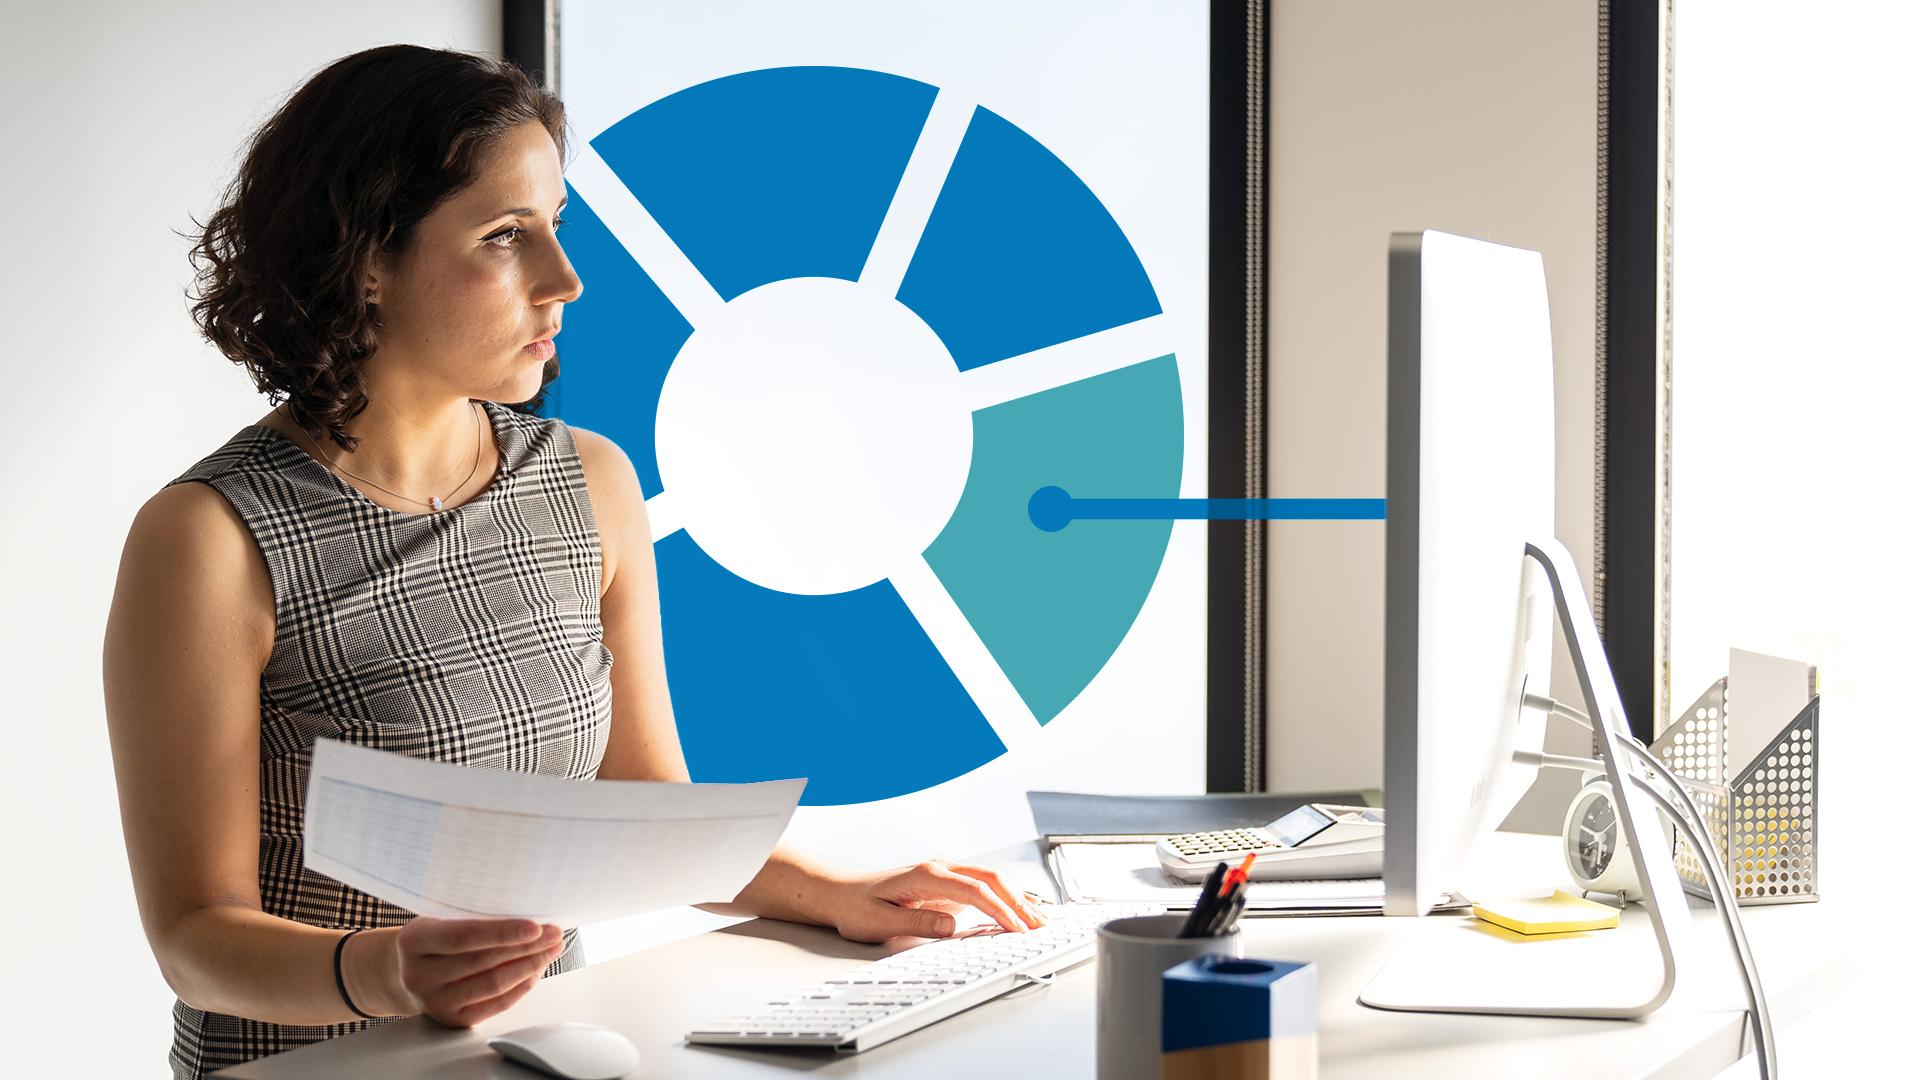 Lynda.com - Project Management Fundamentals Reviews and Pricing